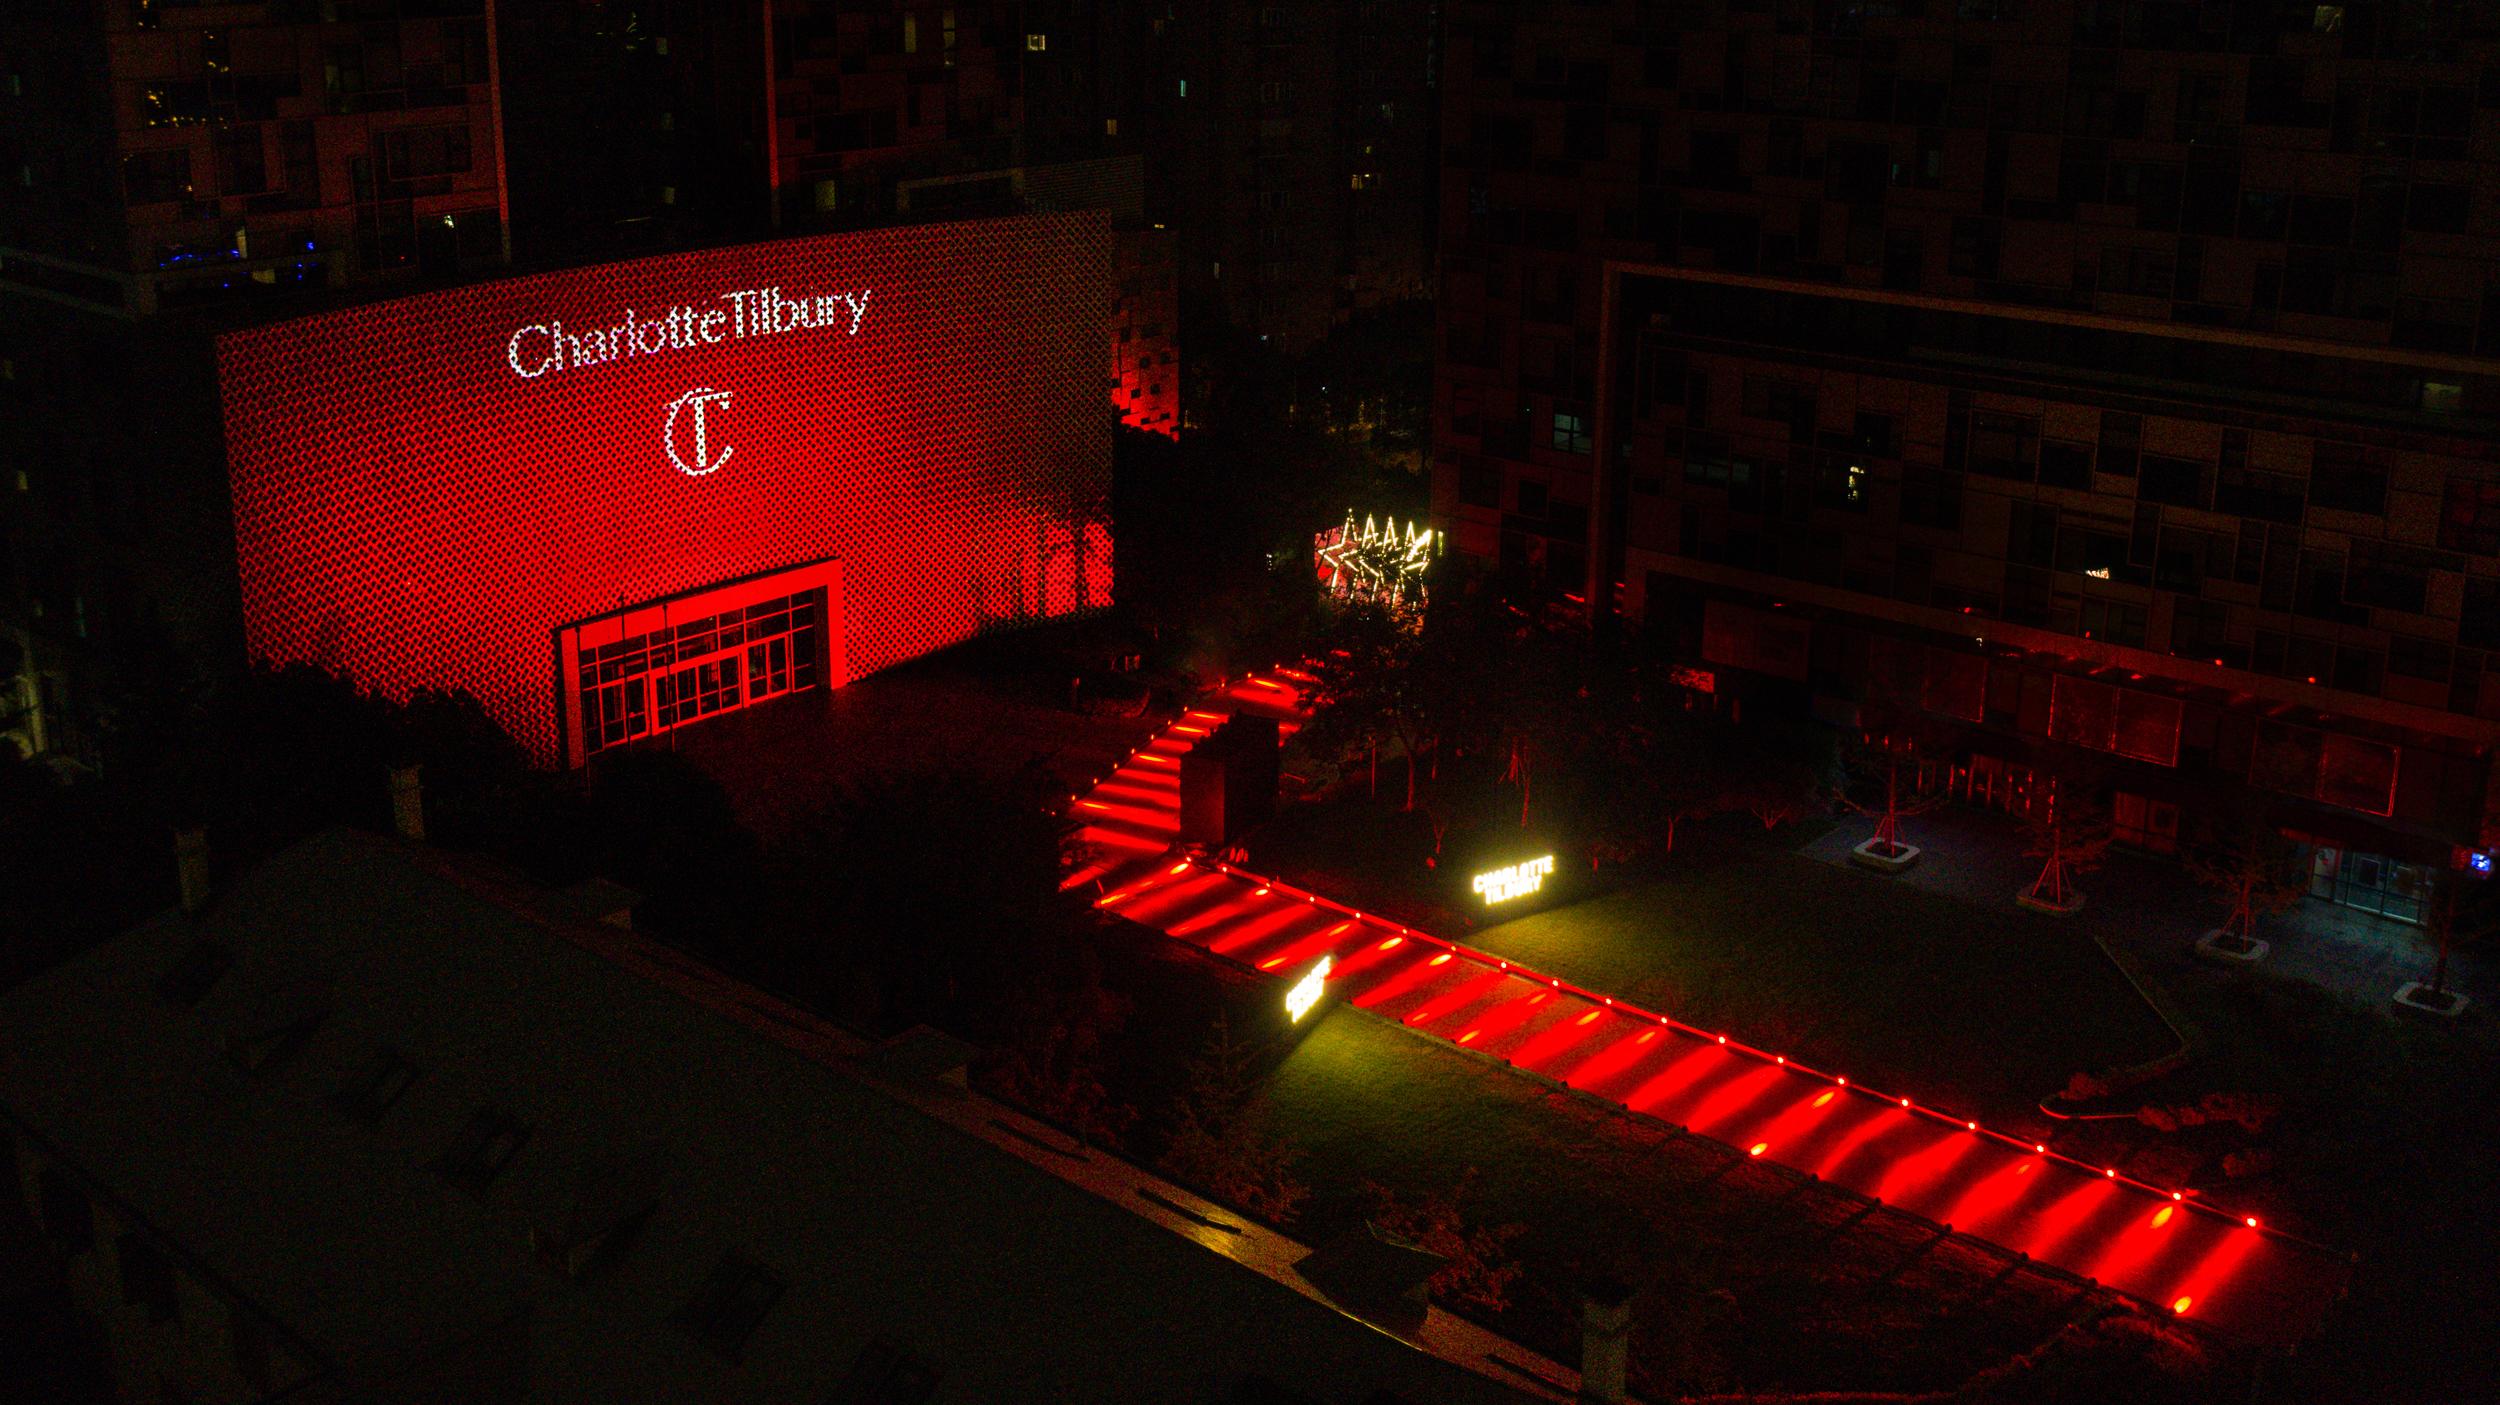 CHARLOTTE TILBURY携手全球彩妆代言人汤唯和刘昊然 宣布品牌正式进驻中国大陆插图